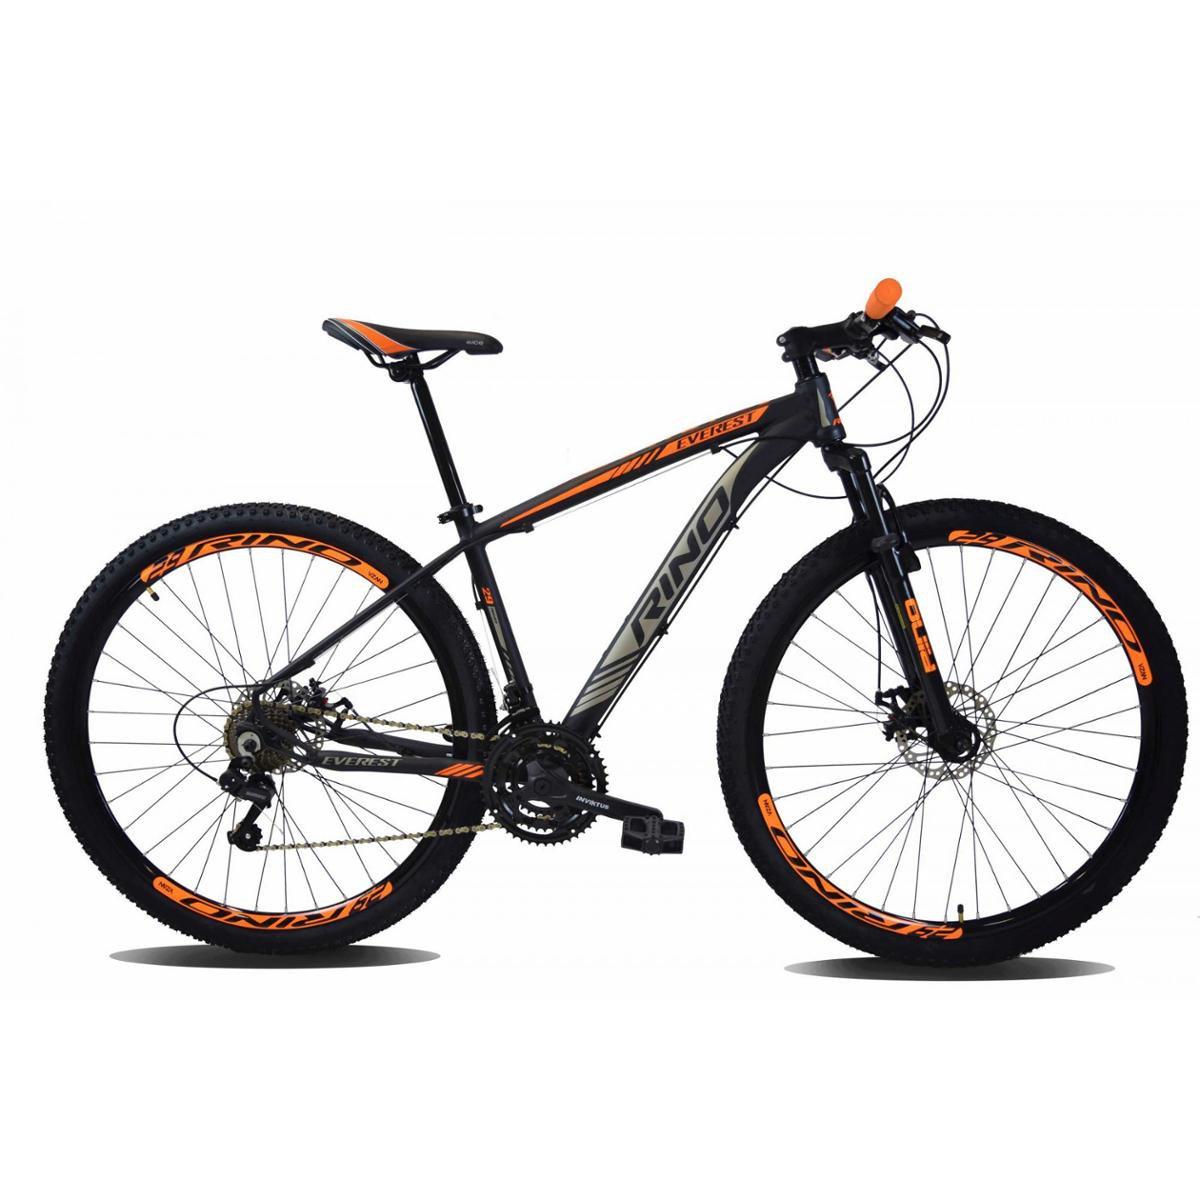 Bicicleta Rino Everest T15 Aro 29 Susp. Dianteira 20 Marchas - Laranja/preto